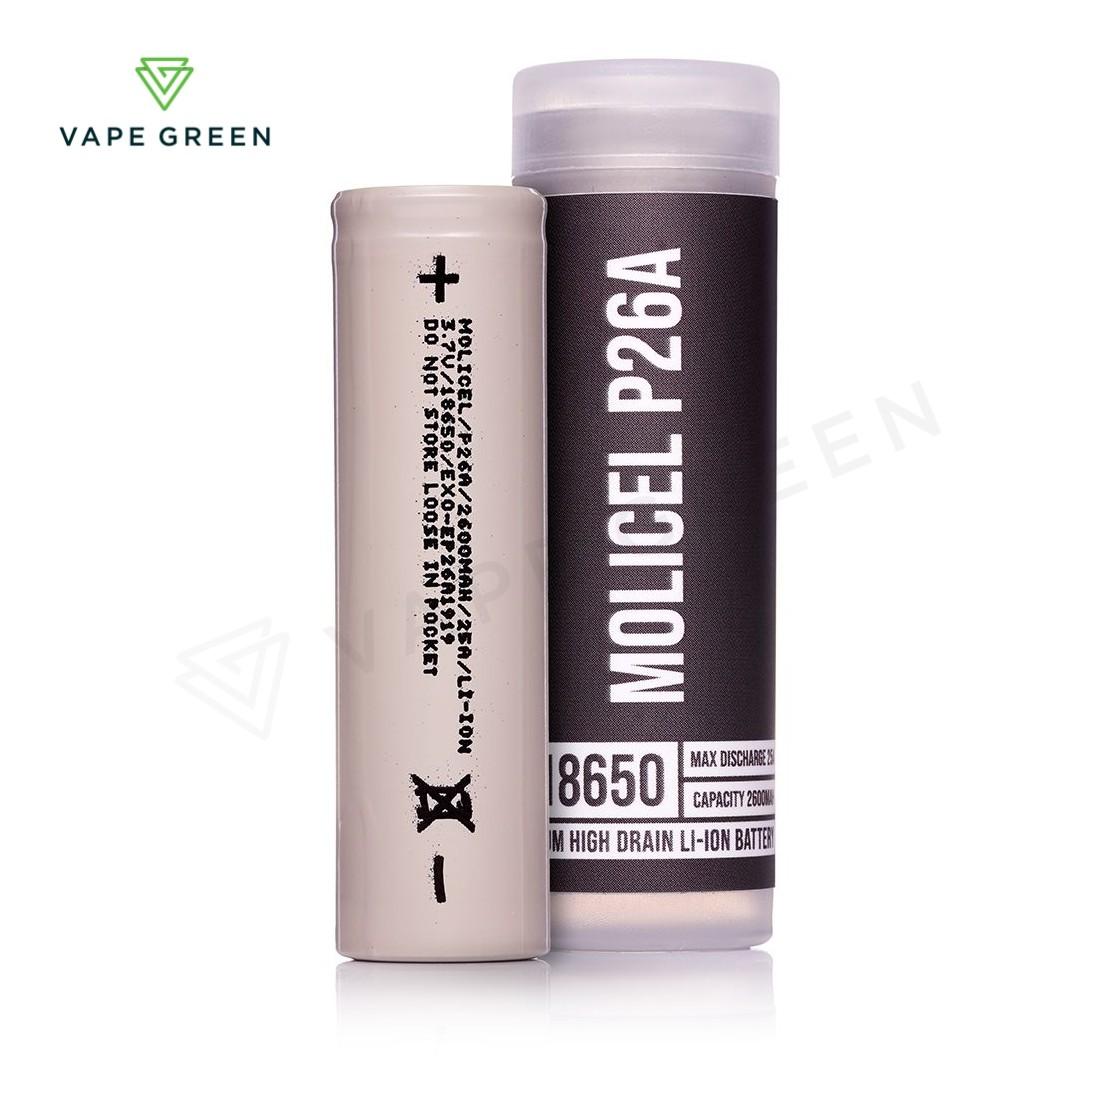 Molicel P26A 18650 2600mAh (25A) Vape Battery